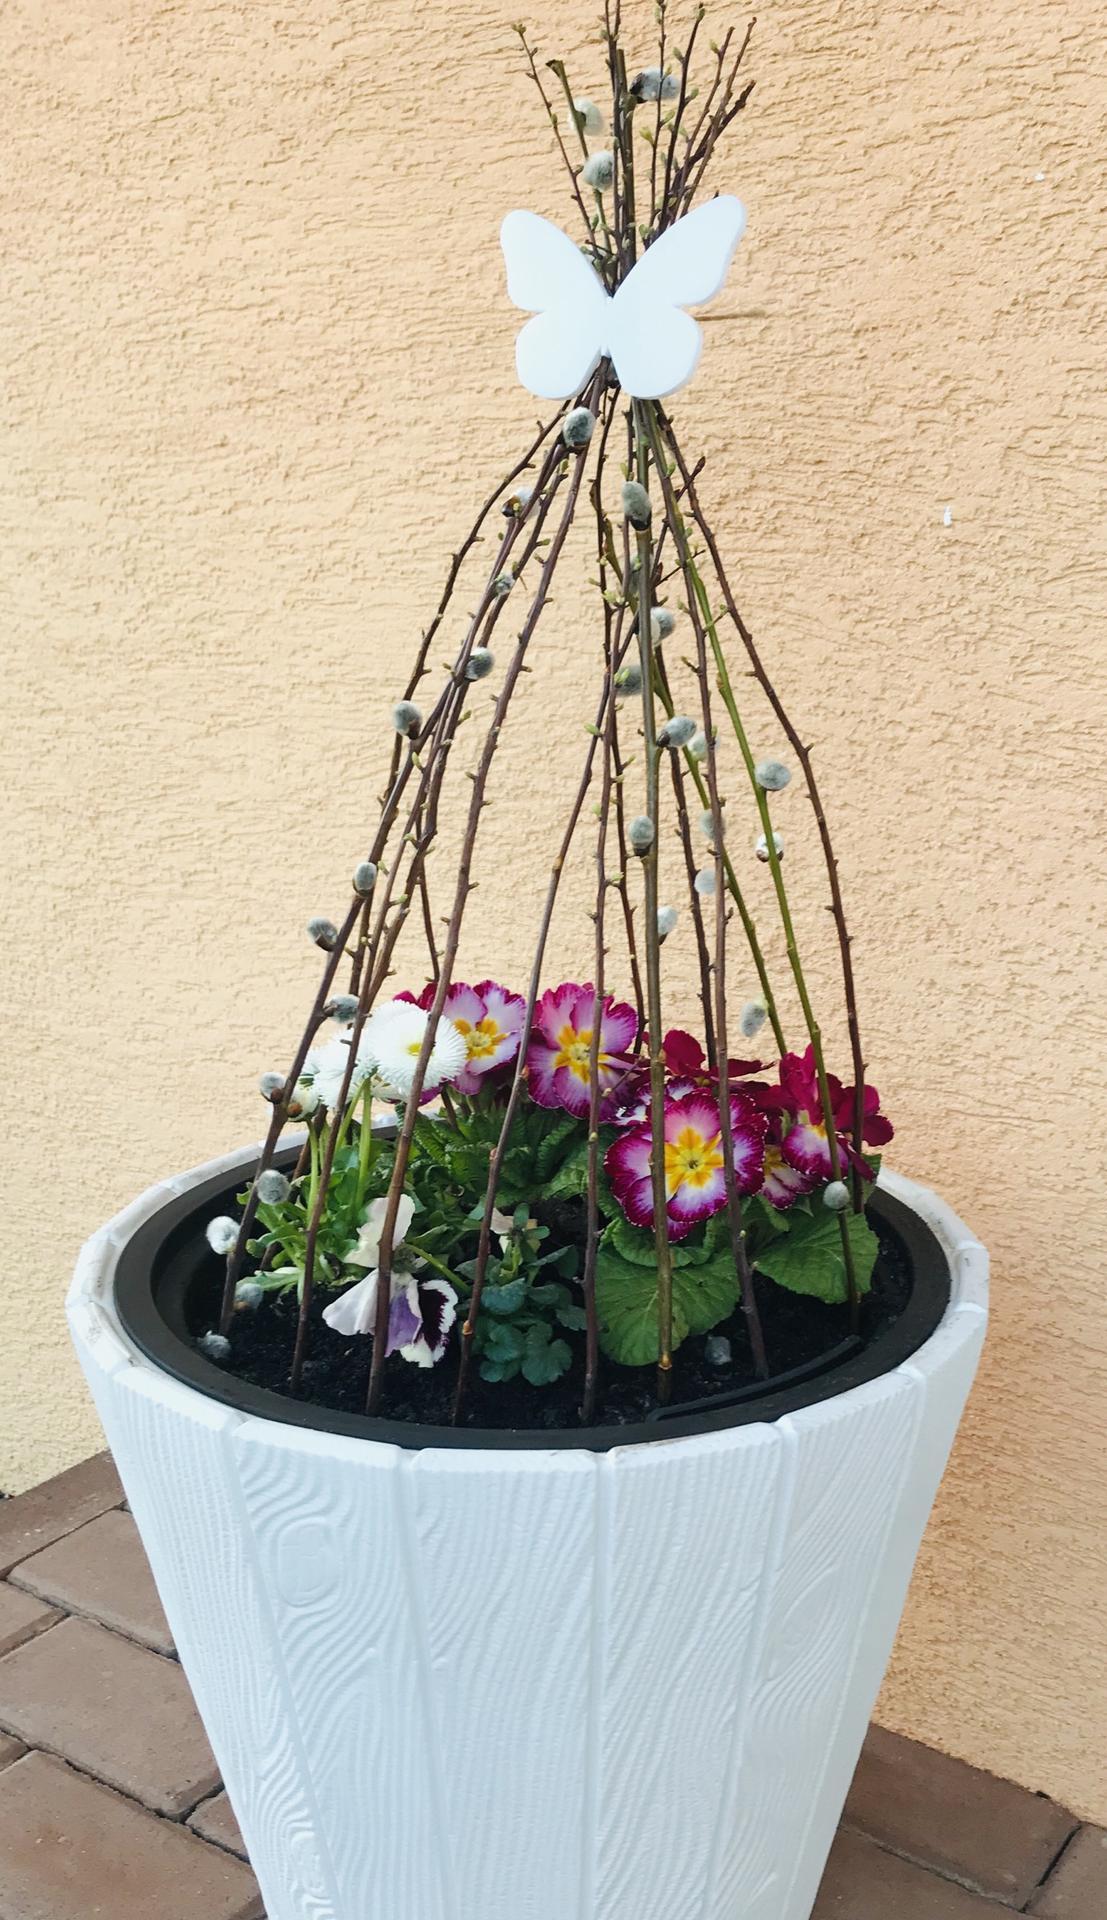 Naše barevná zahrada 🌸 - Obrázek č. 2